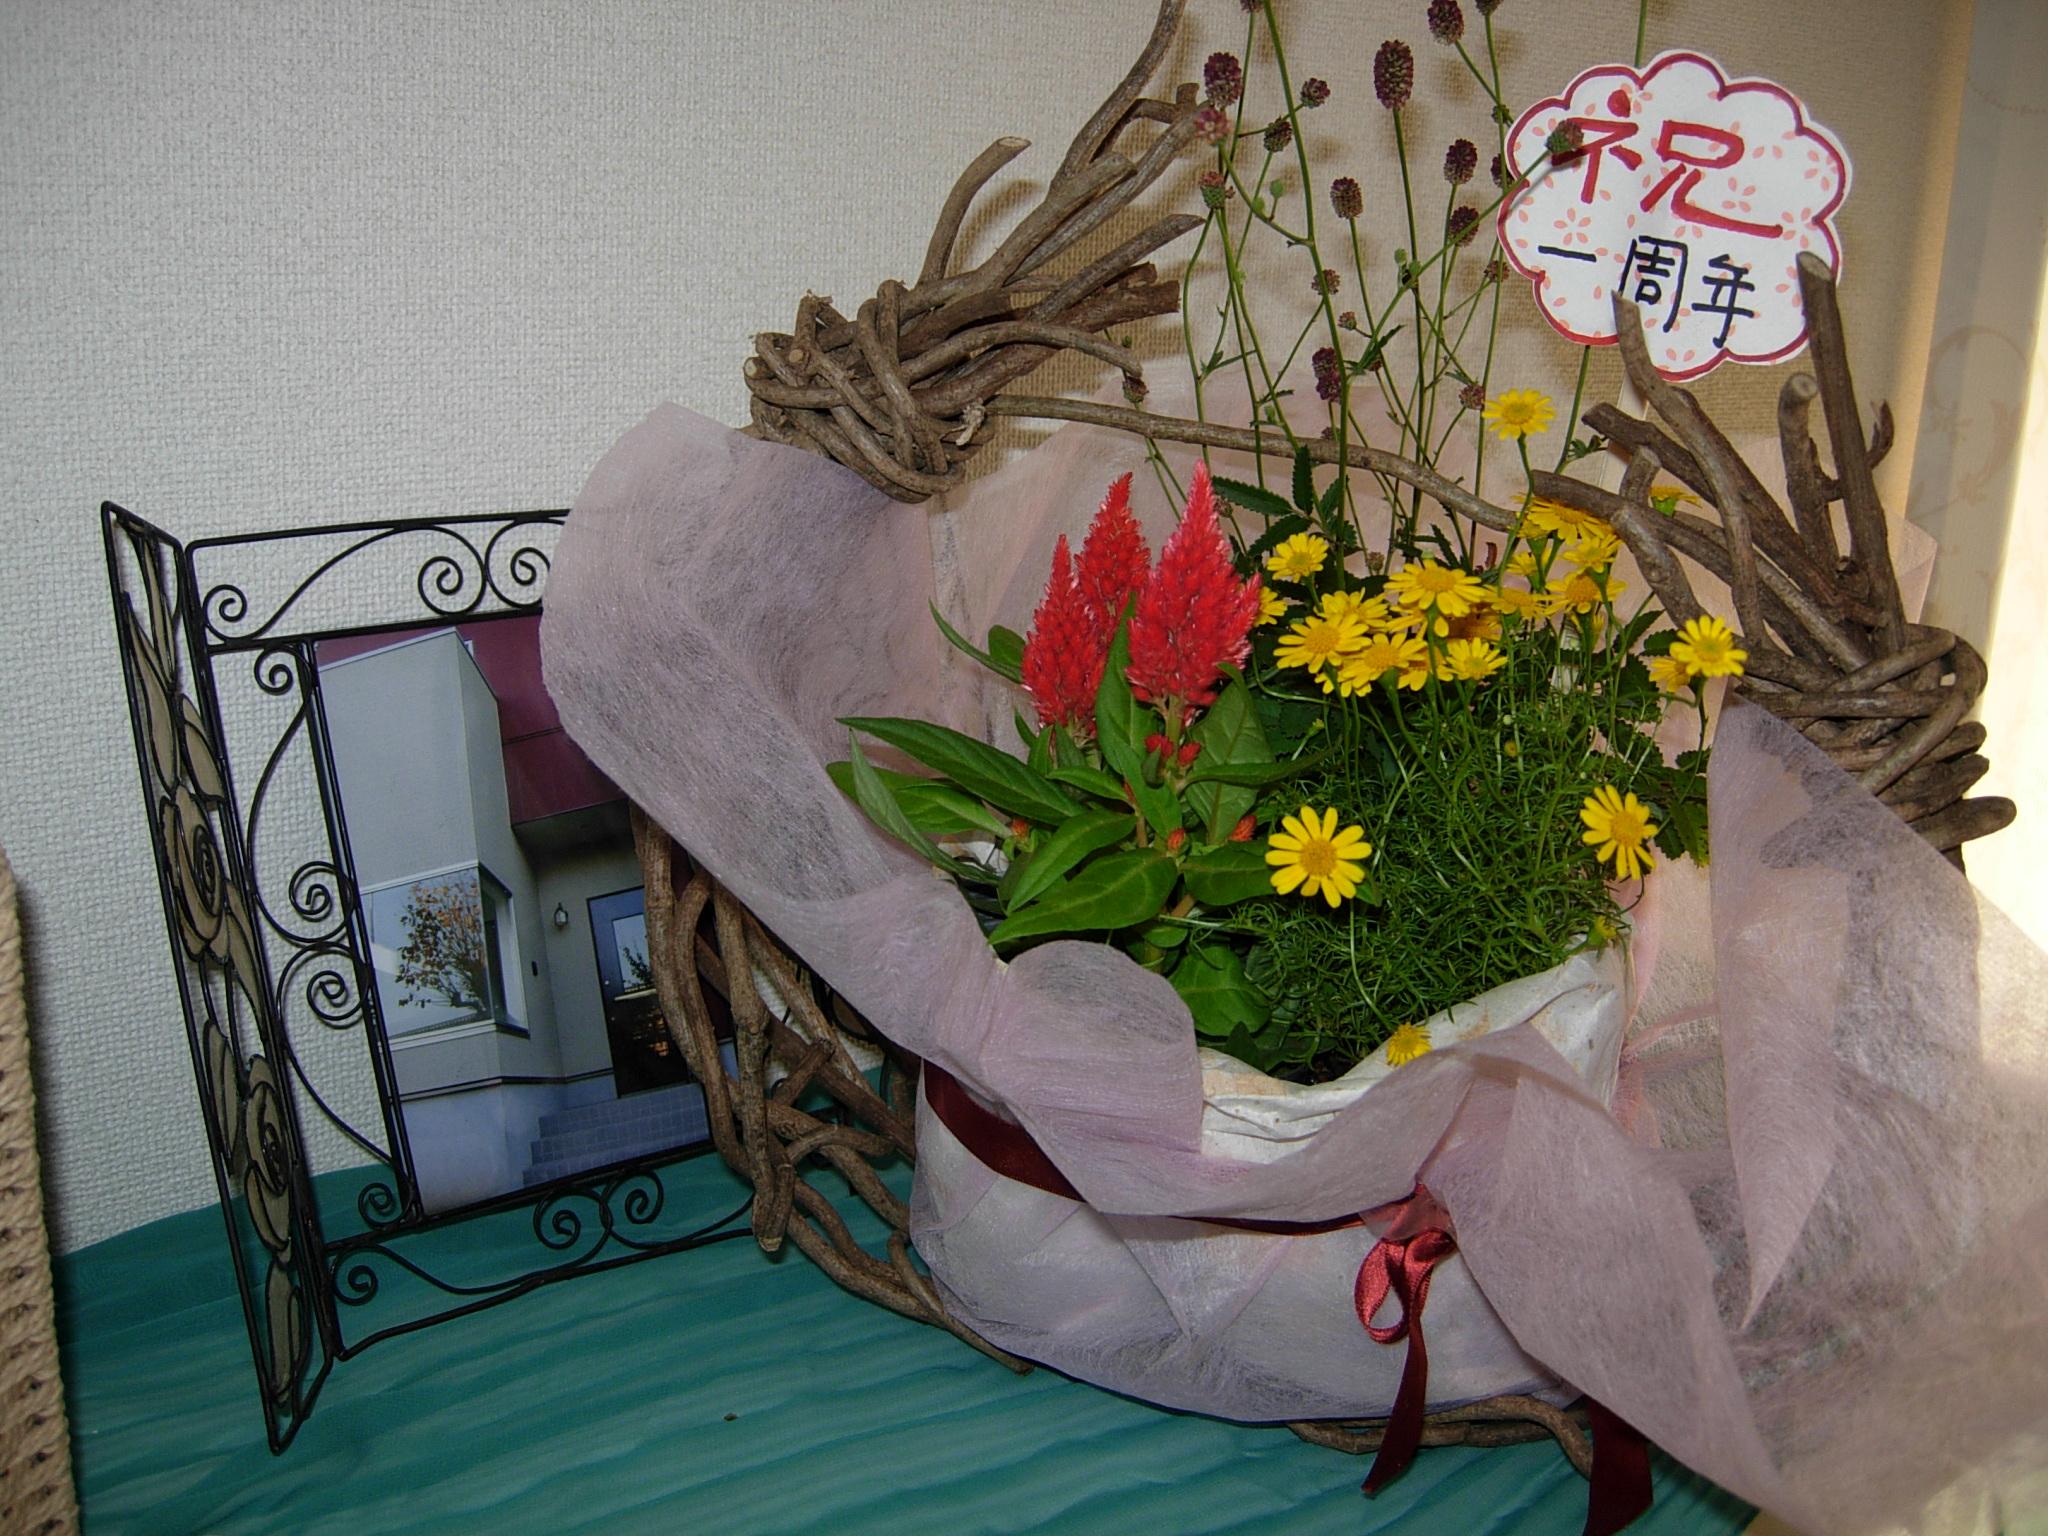 http://chanter-yachiyo.com/2011/07/09/2011_0706_165336-DSCN1455.JPG